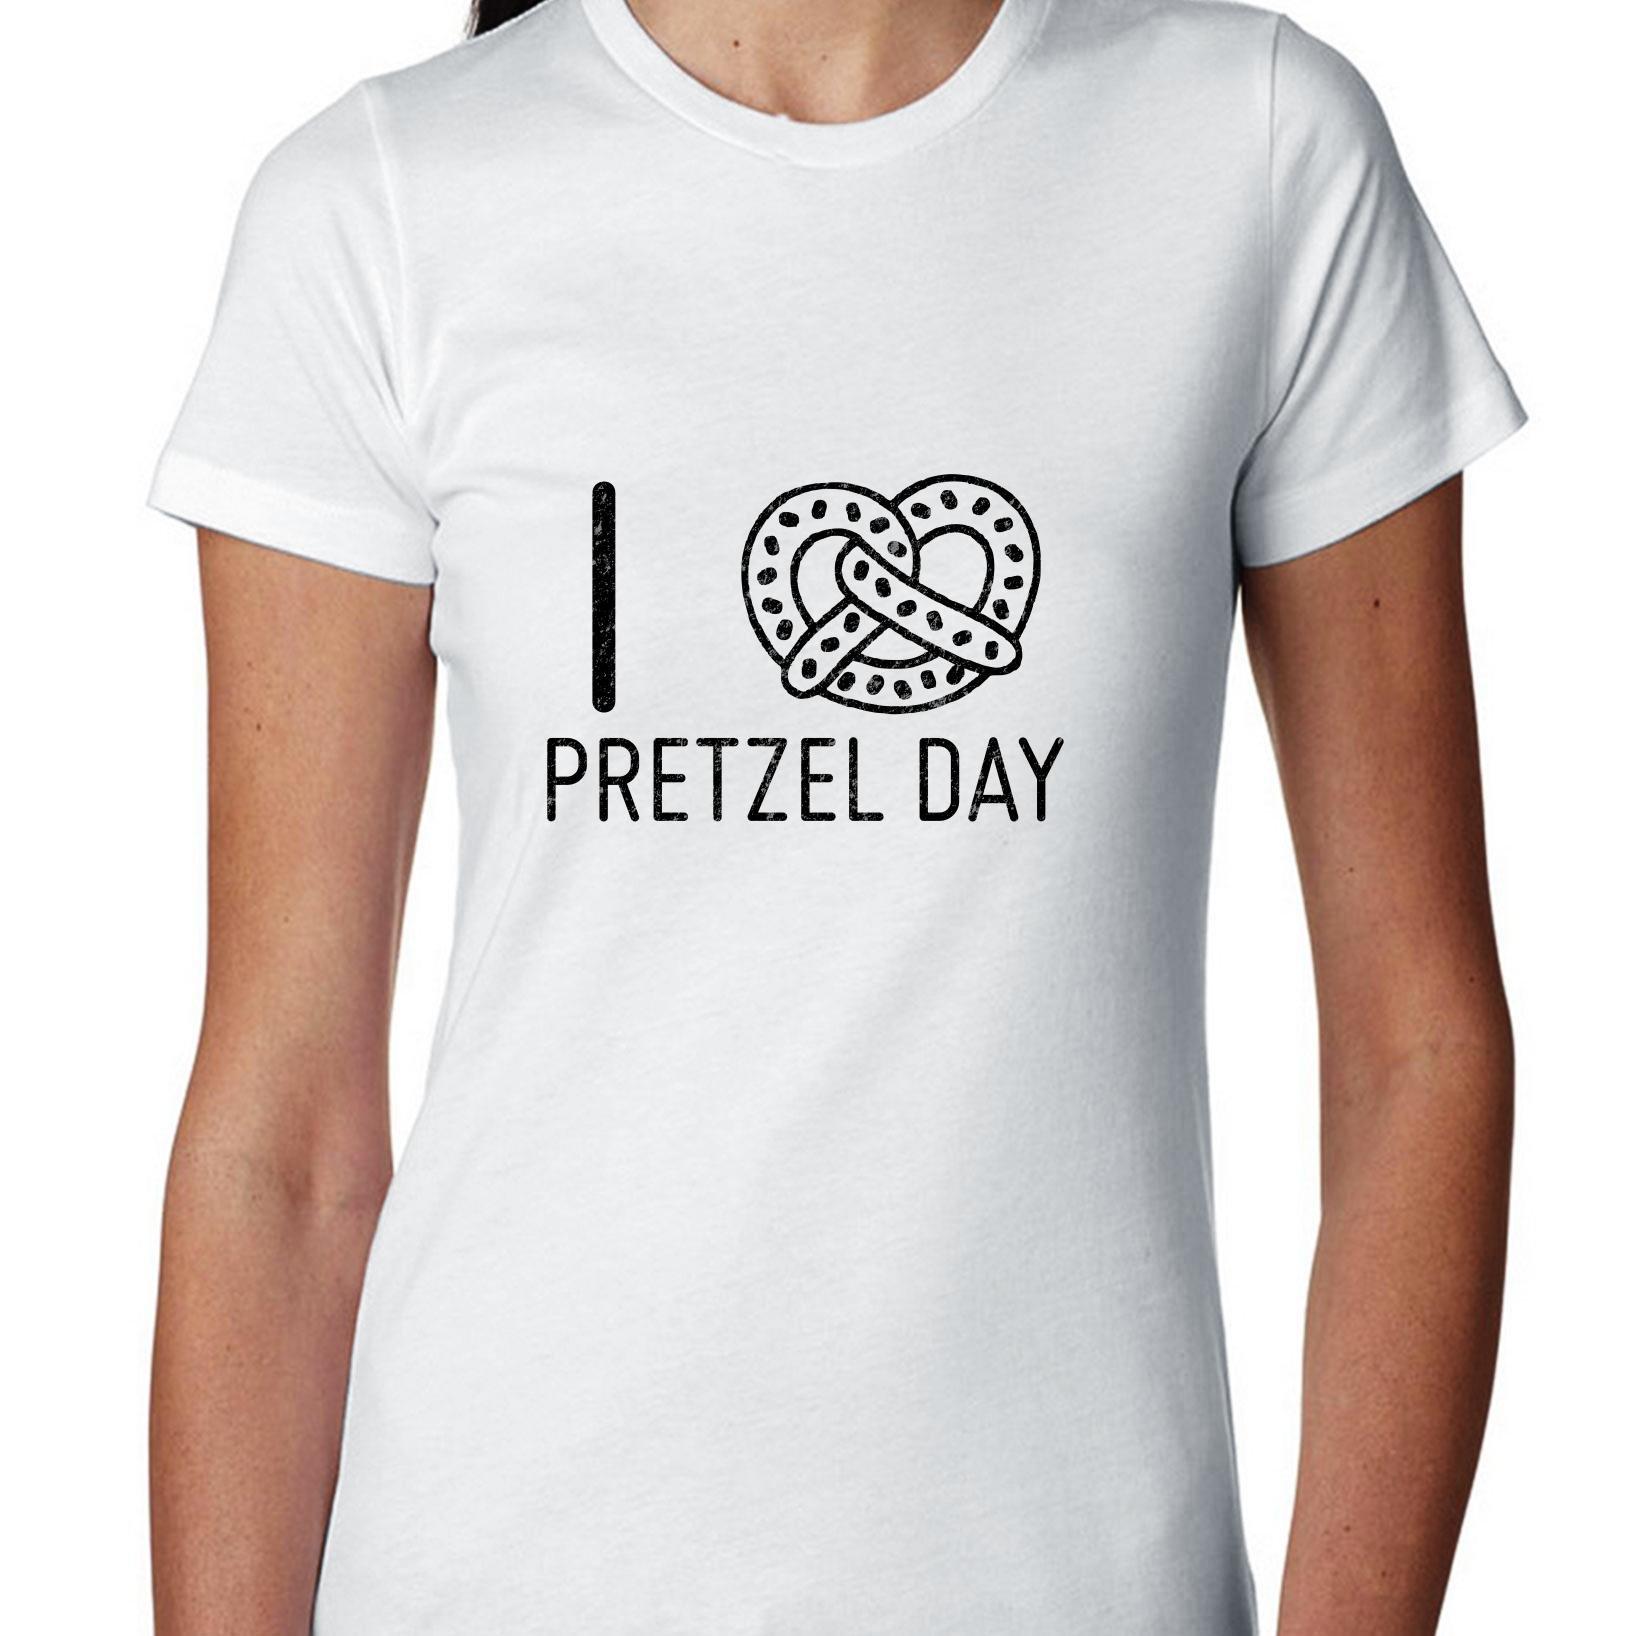 Hollywood Thread I Love Pretzel Day With Cool Pretzel Graphic T Shirt 7176